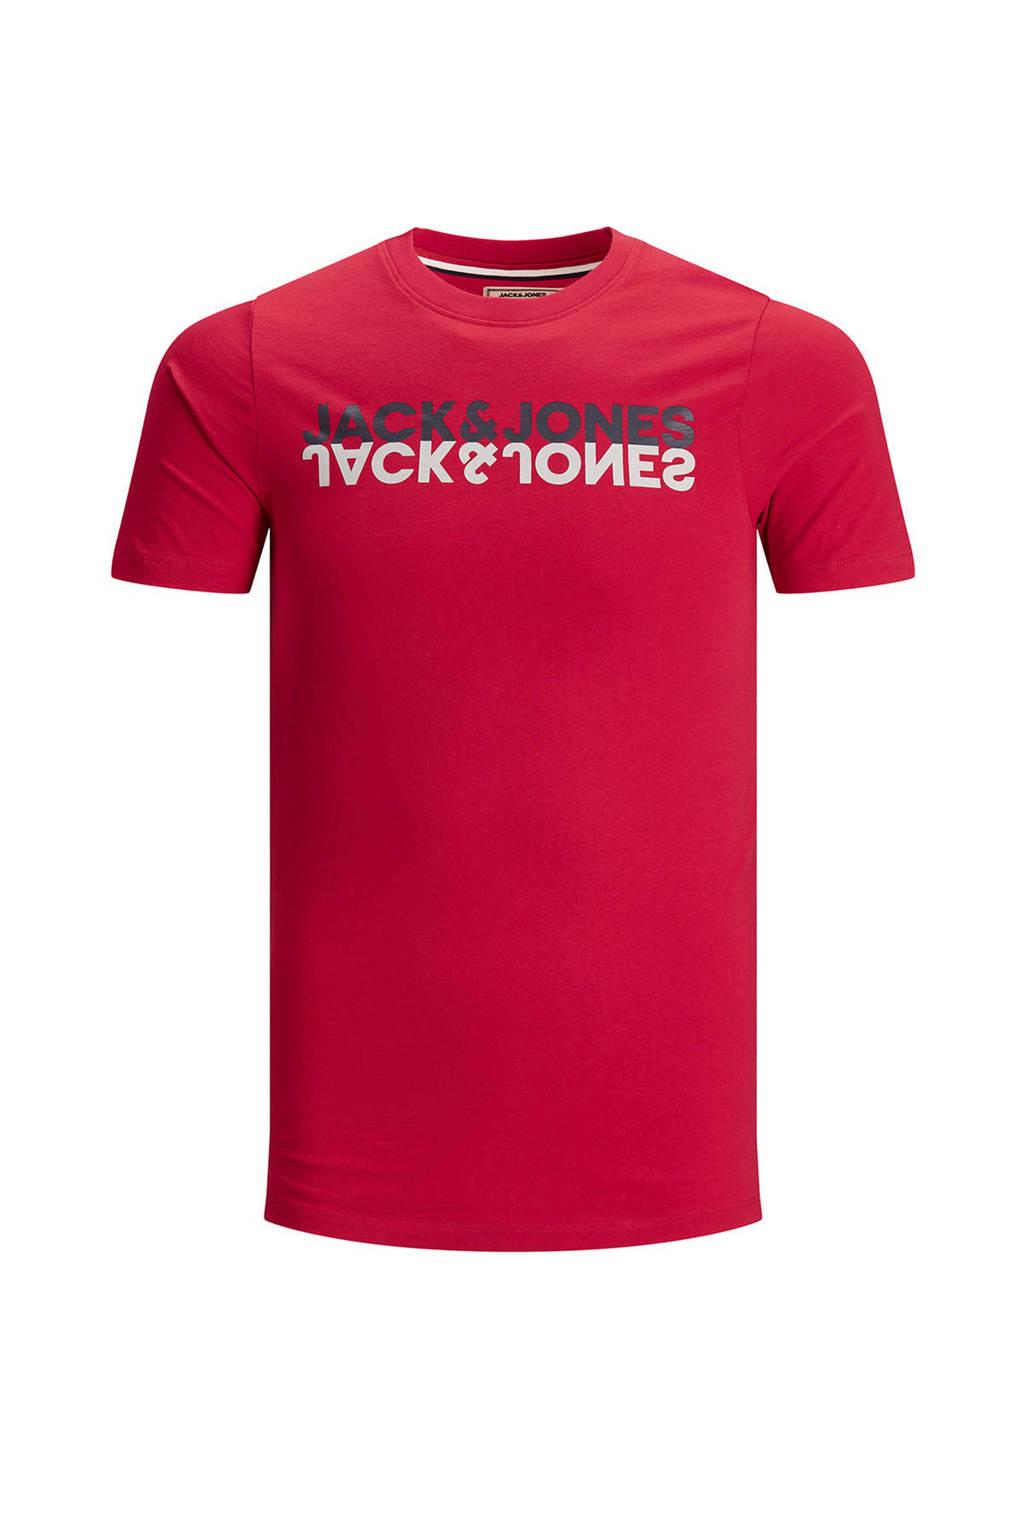 JACK & JONES T-shirt met logo rood, Rood